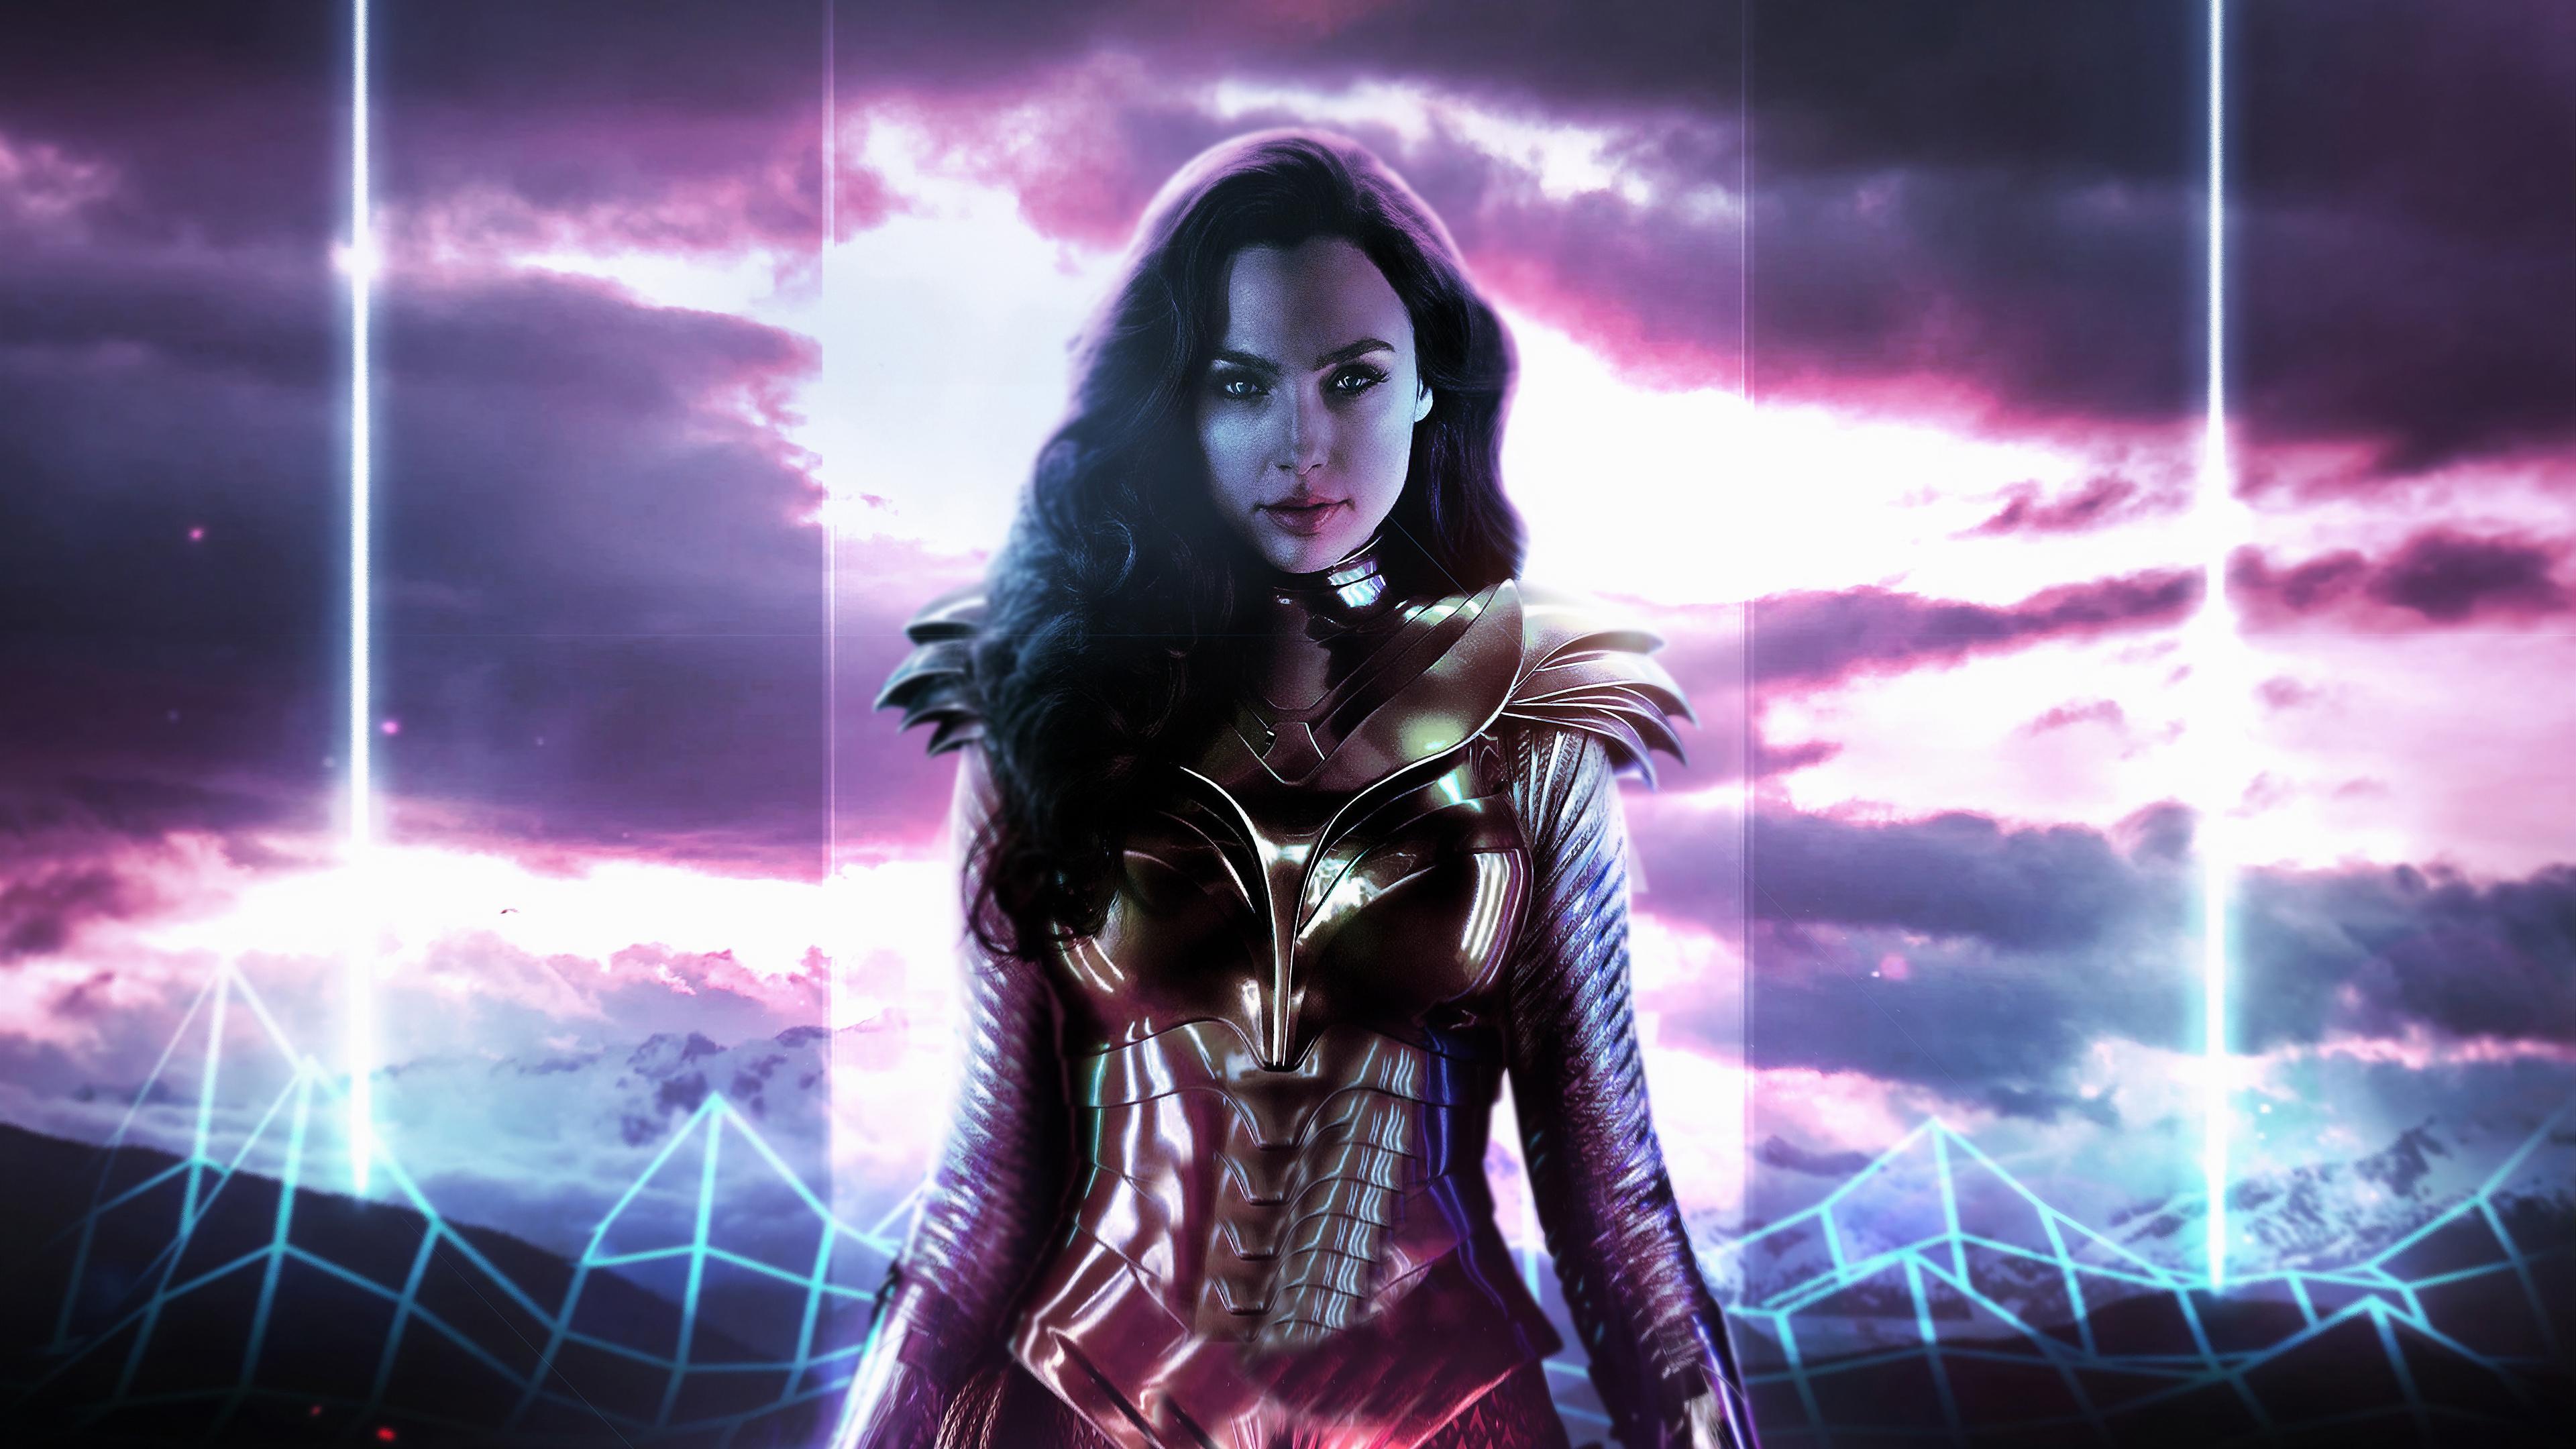 Wallpaper 4k Wonder Woman 1984 Movie Neon 2020 movies wallpapers 3840x2160